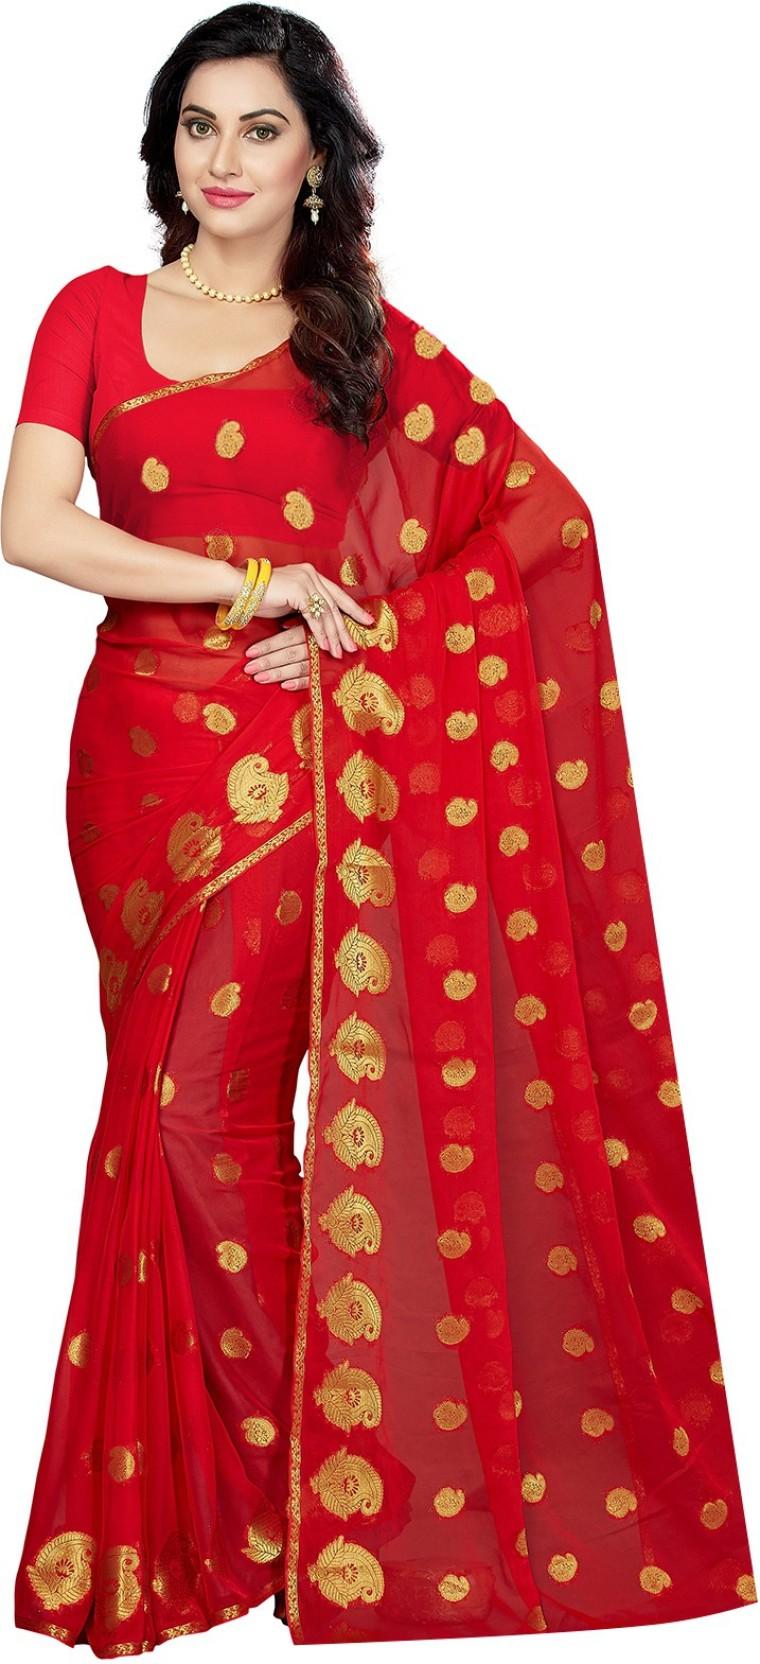 1b2a636c30 Buy Ishin Woven Bollywood Chiffon Multicolor Sarees Online @ Best ...